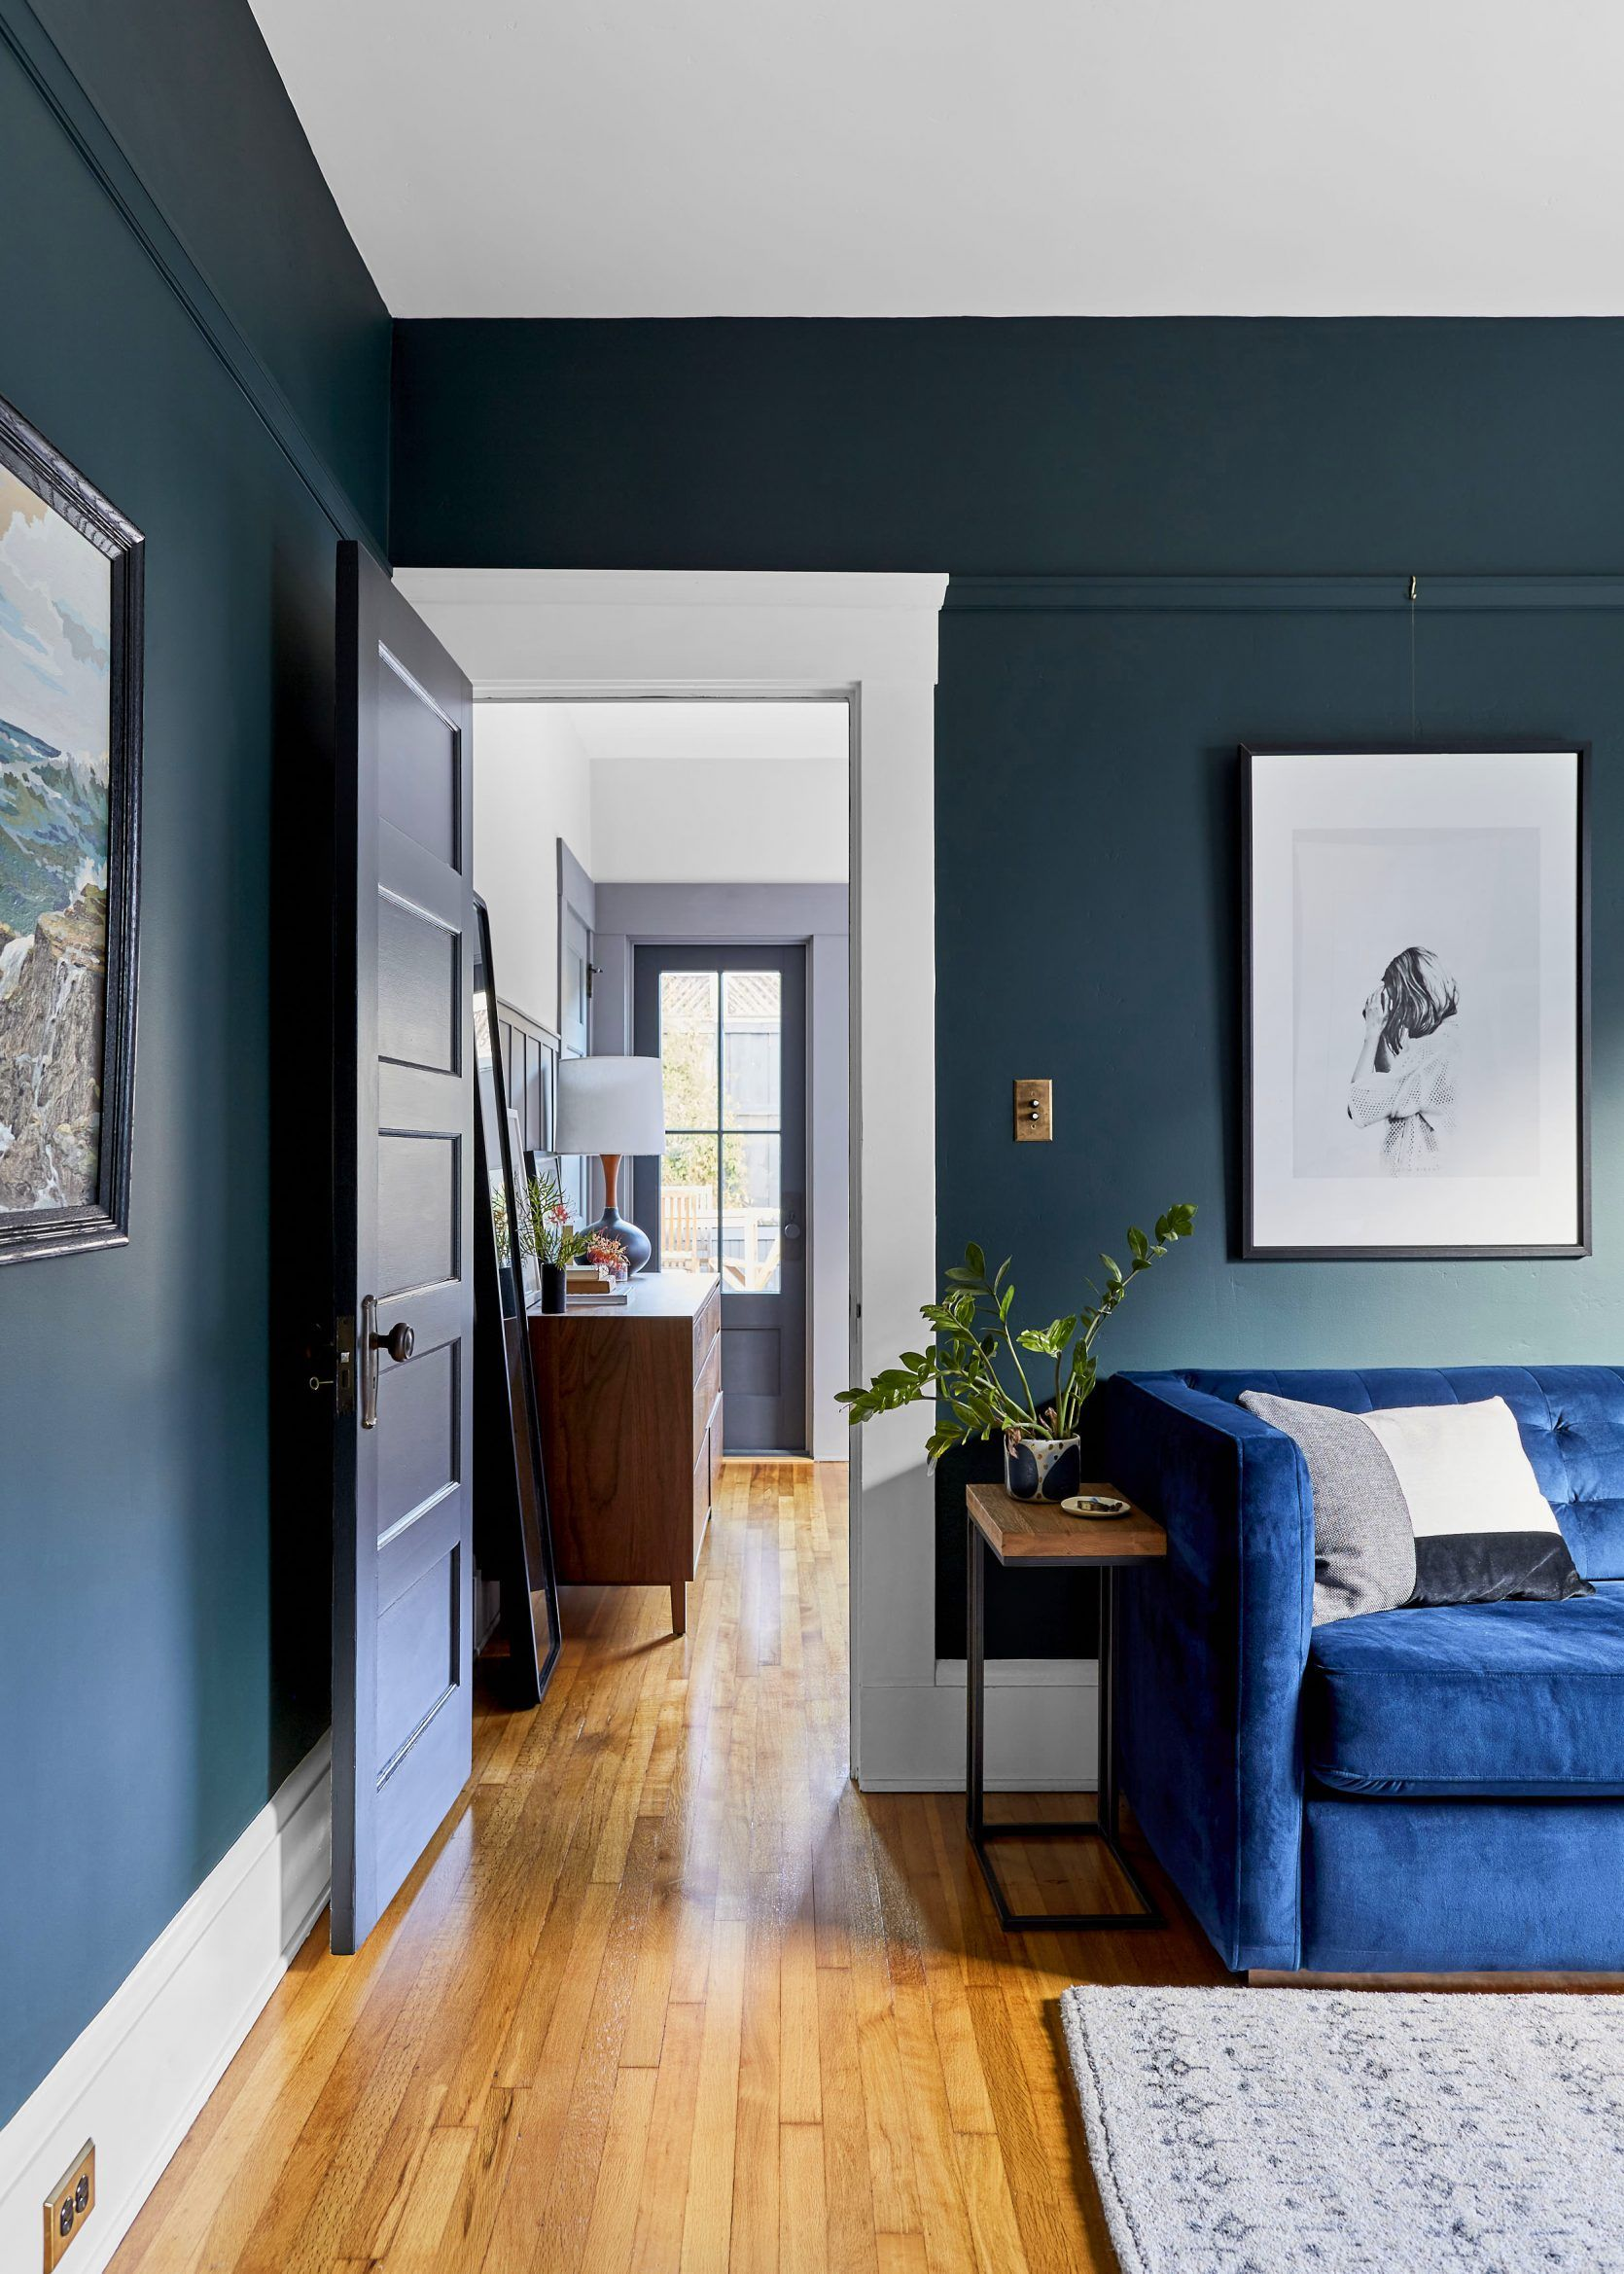 2019 Paint Color Trends Paint Colors For Living Room Blue